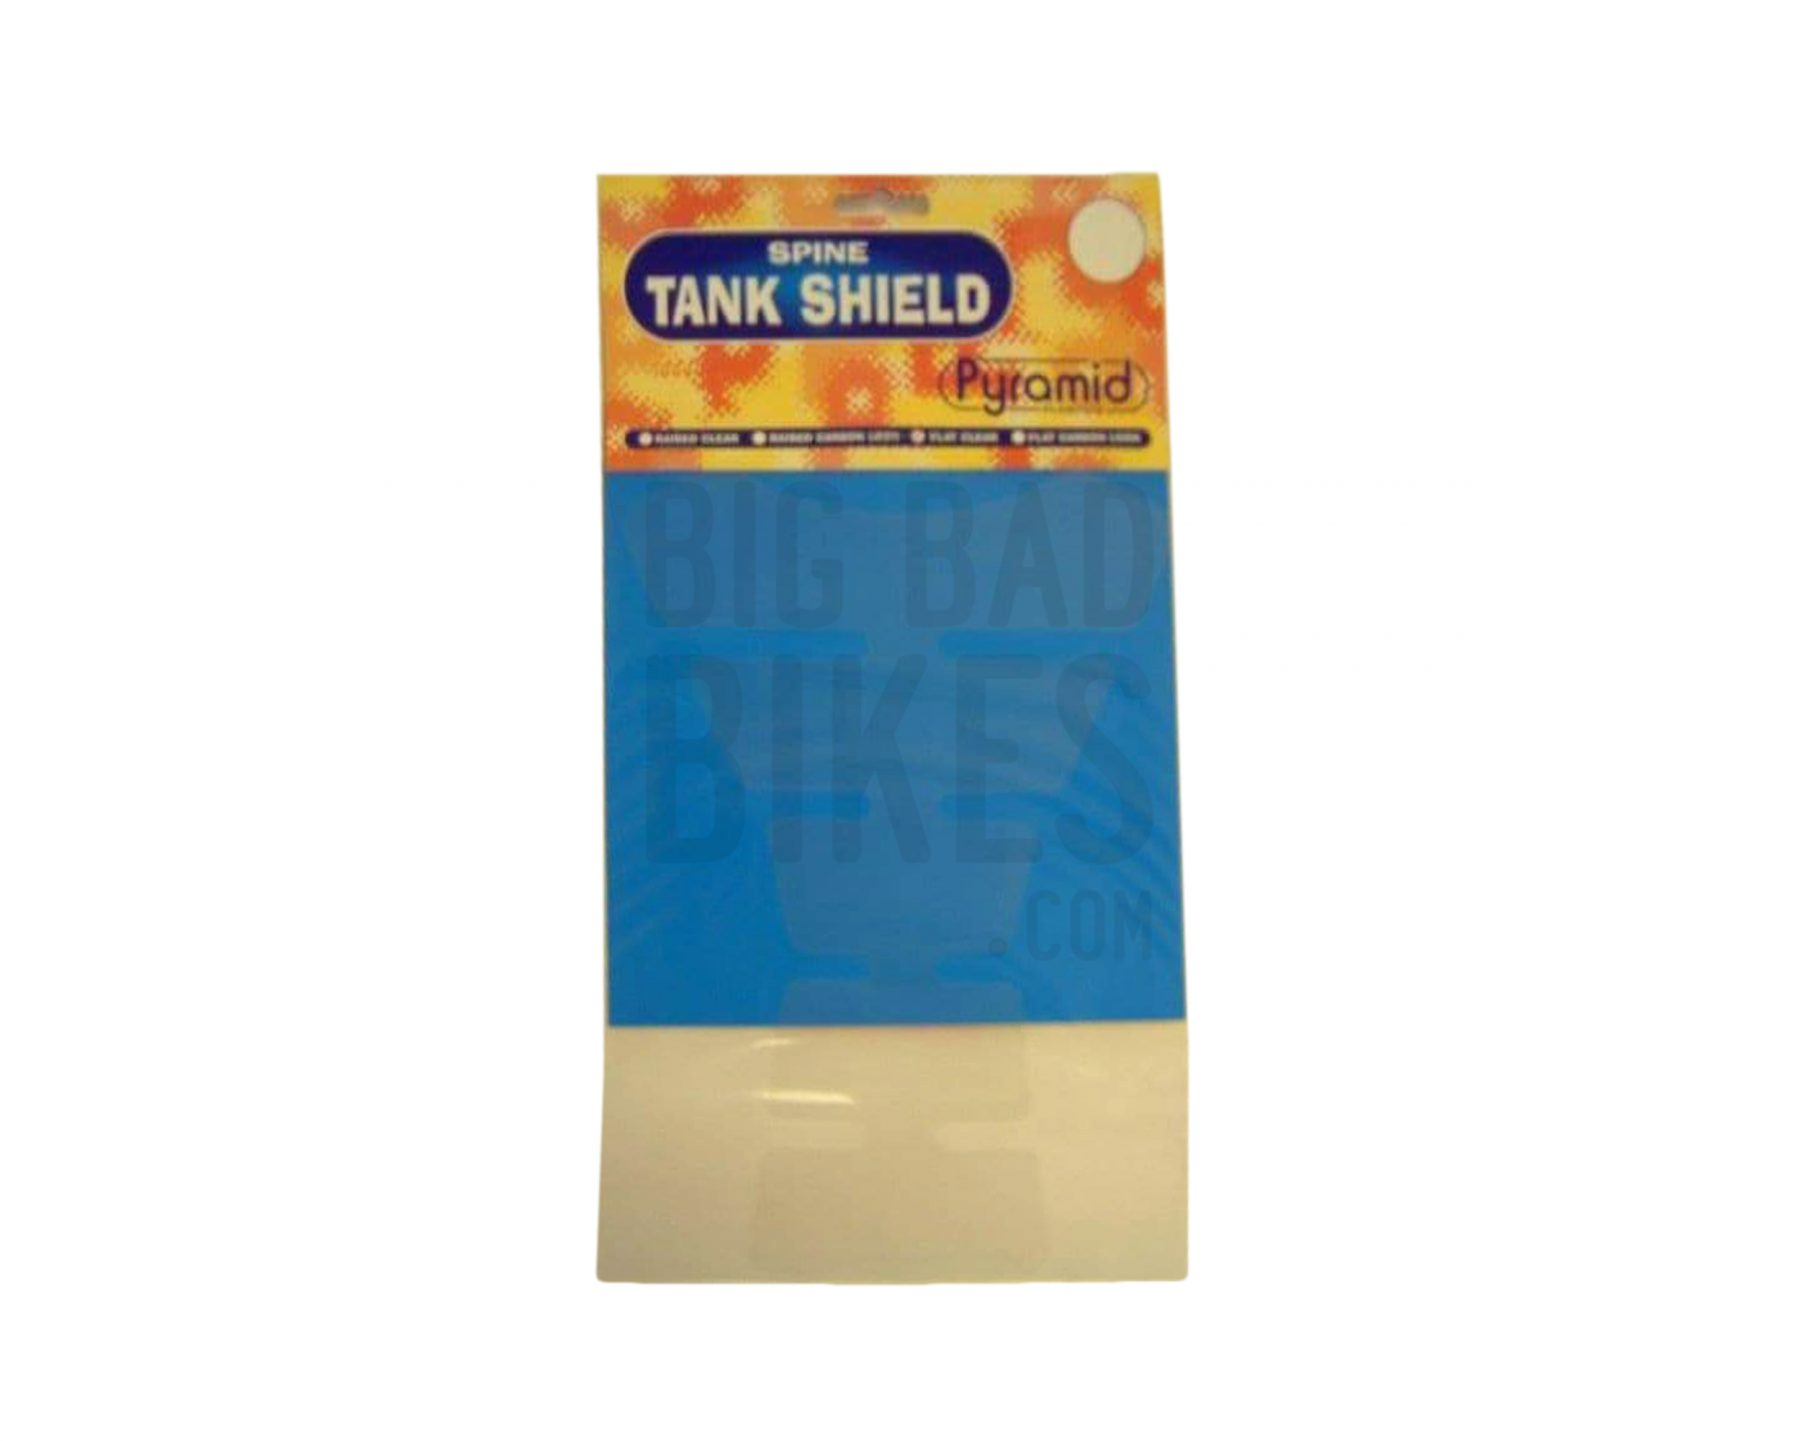 08053 pyramid-tank-shield-clear-tank-protection-08053_1024x1024@2x